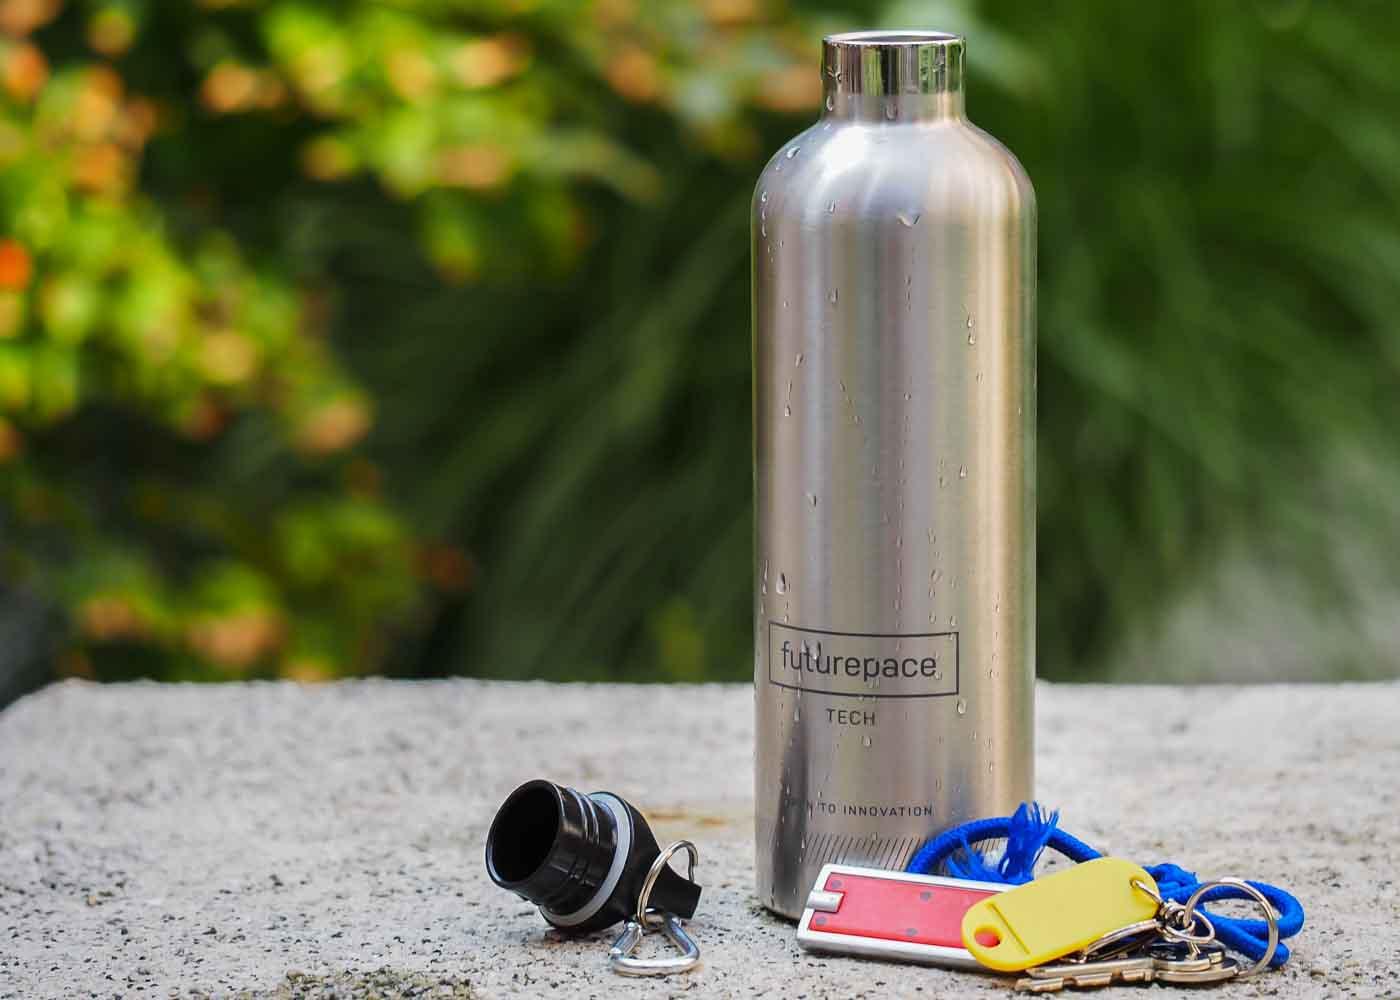 Futurepace Tech stainless steel water bottle.